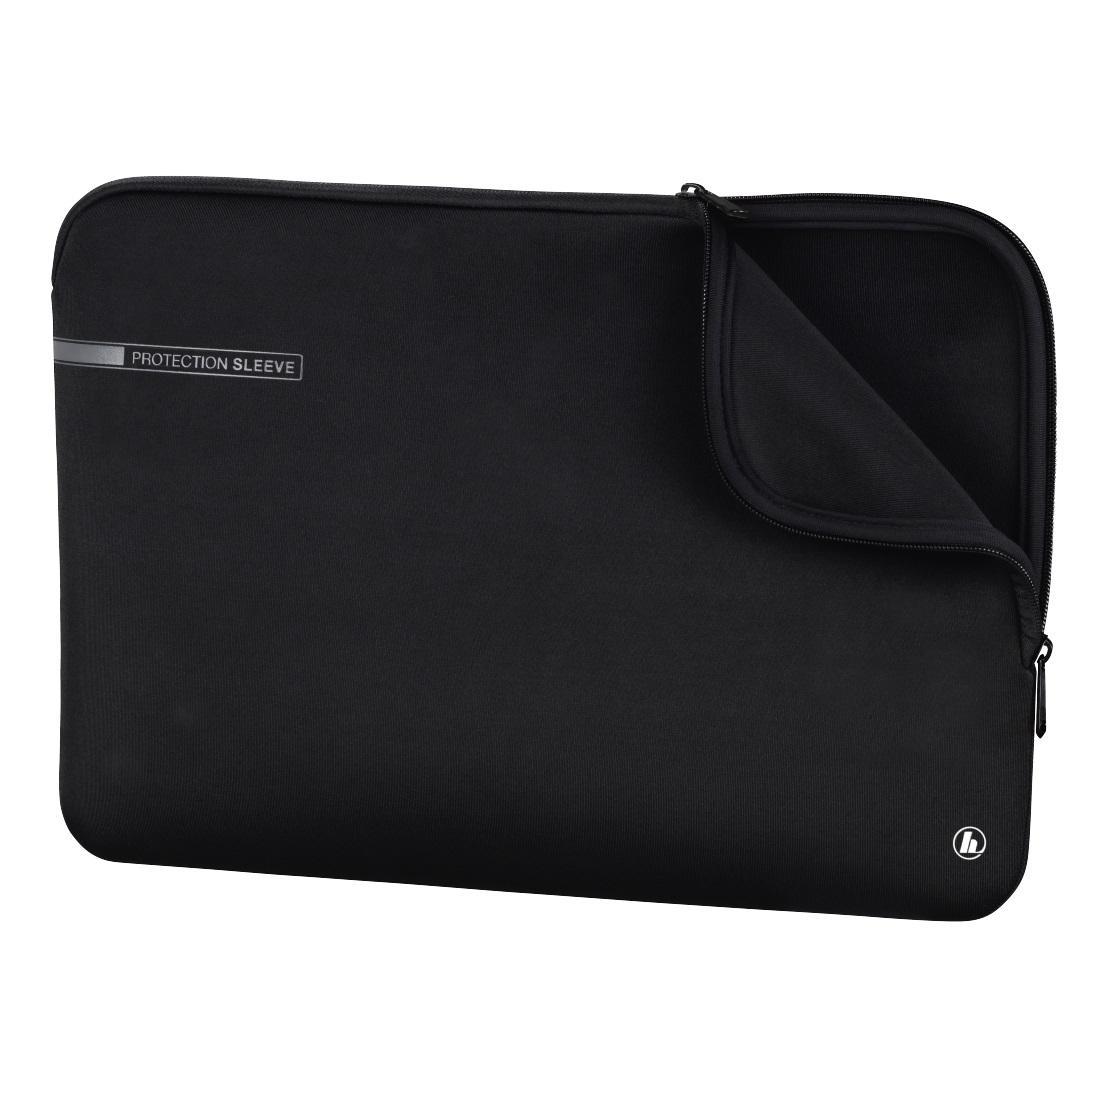 Калъф за лаптоп HAMA Neoprene, до 44 cm (17.3), Черен